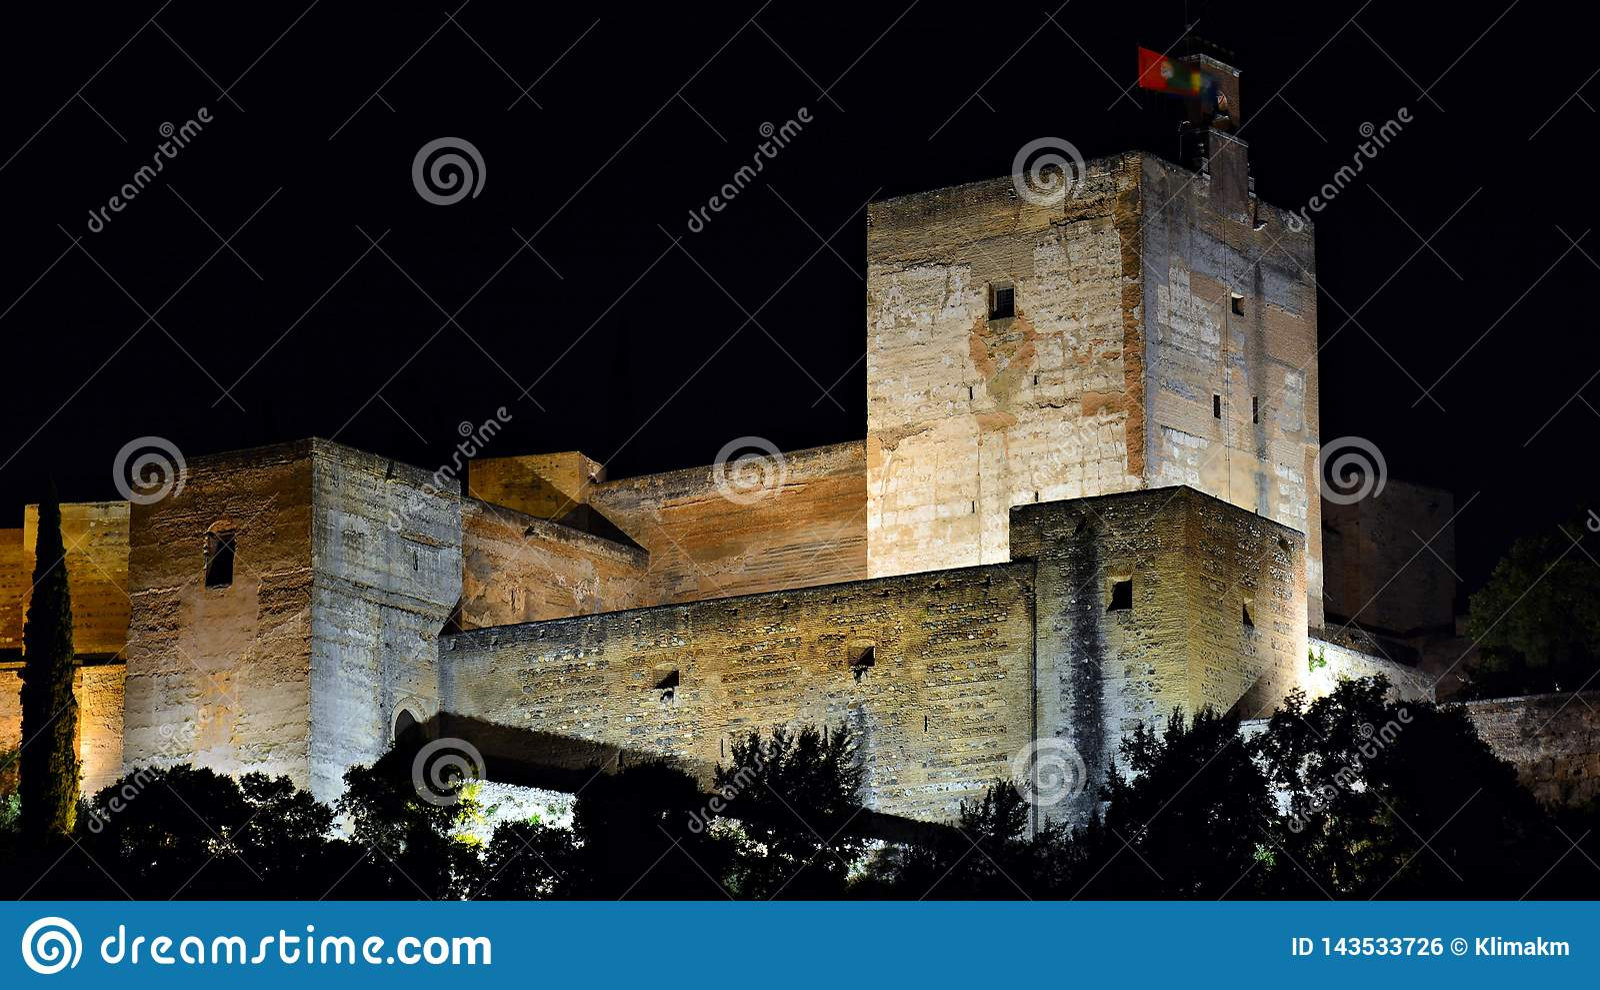 The Alhambra of Granada, night